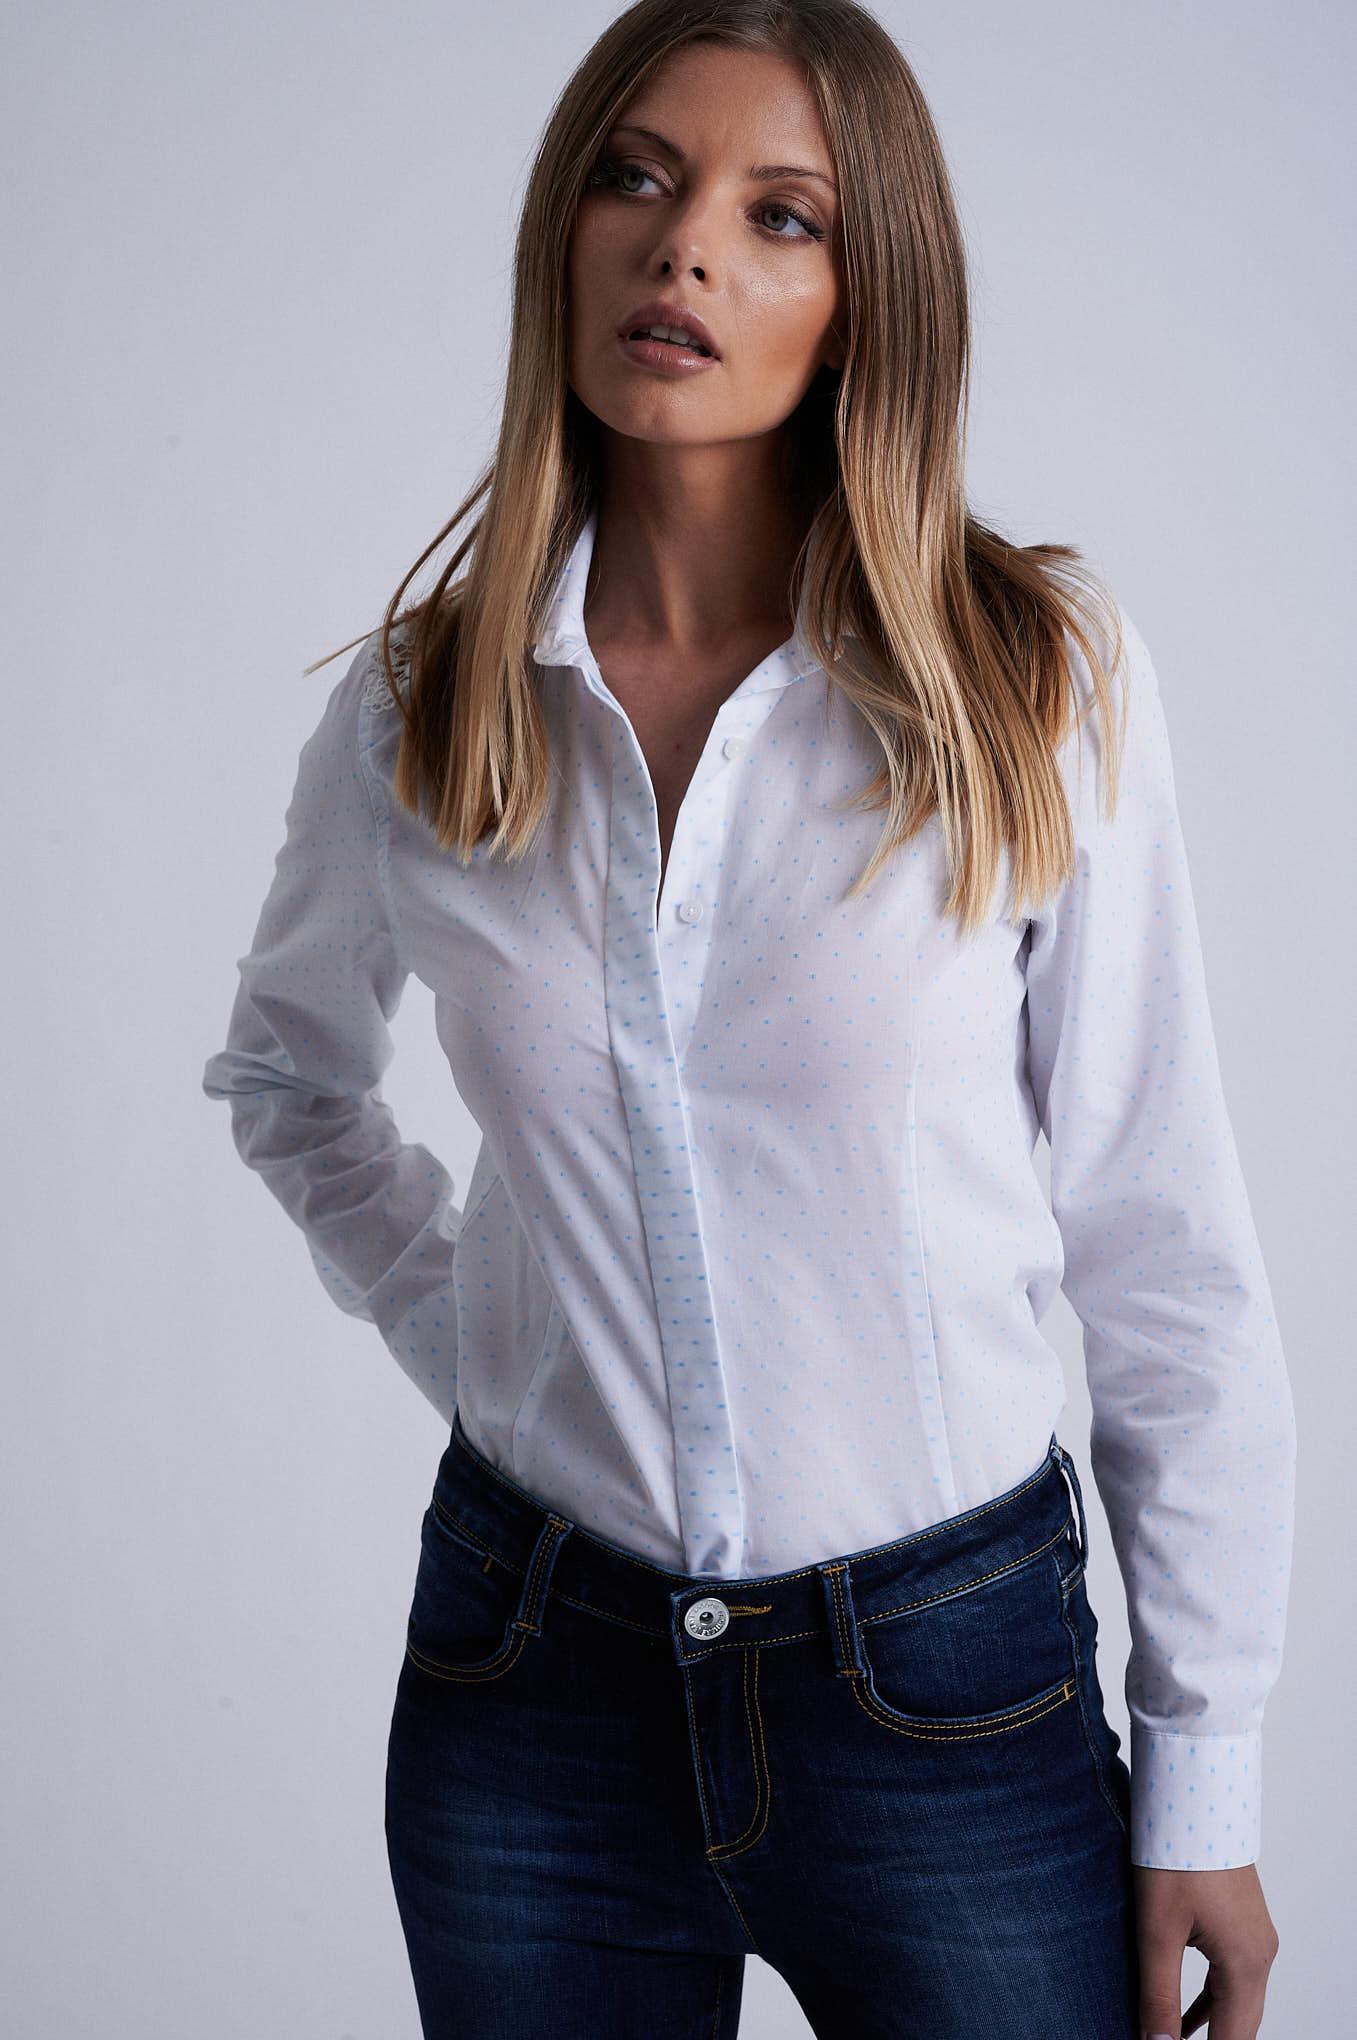 Shirt Turquoise Formal Woman